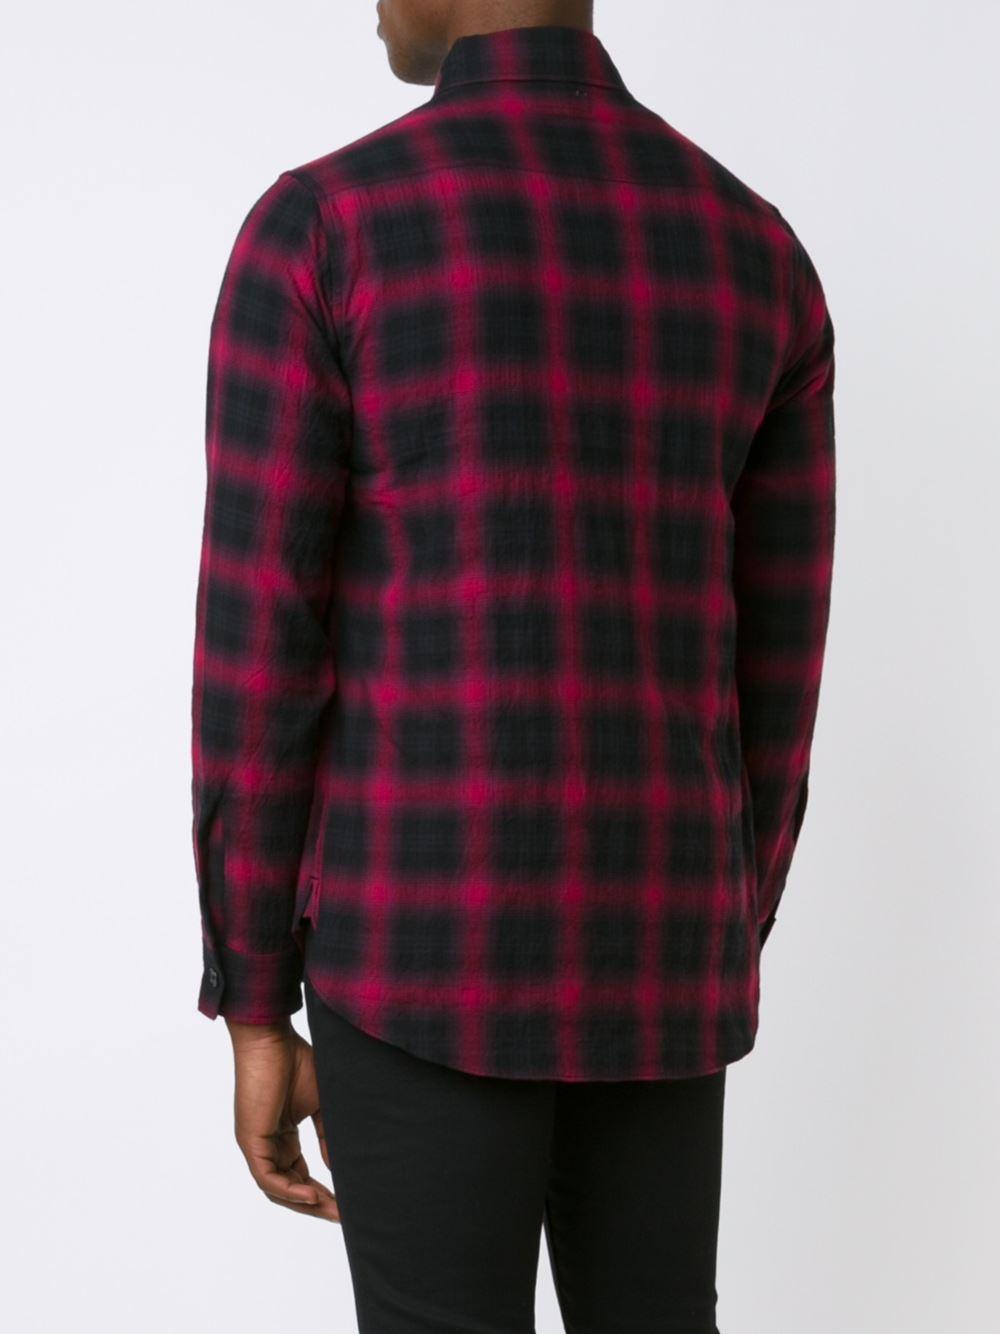 saint-laurent-check-shirt-4